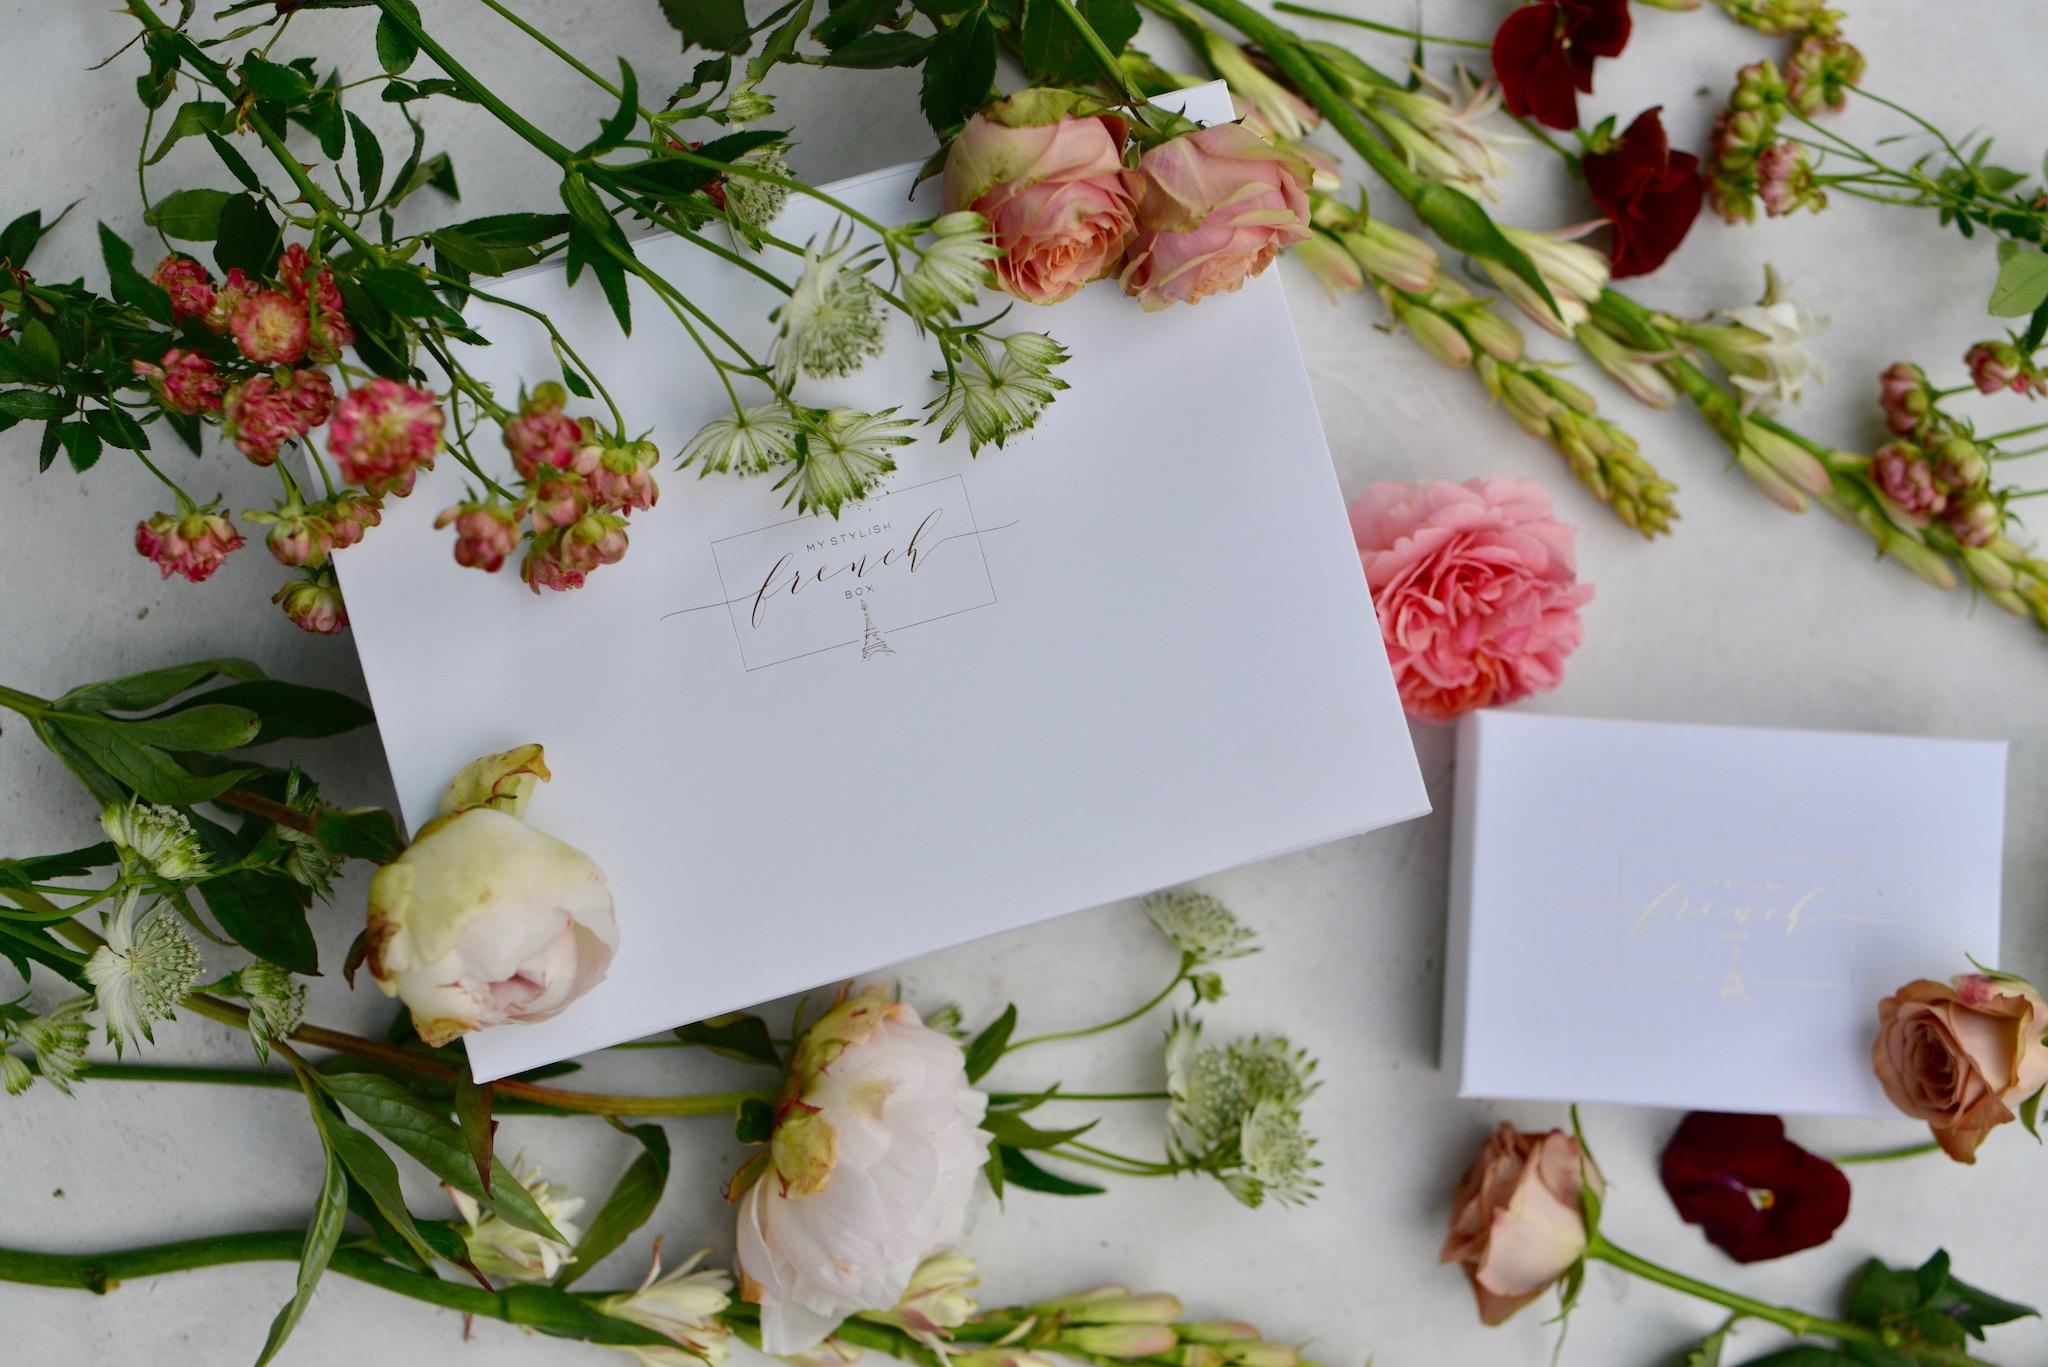 A handwritten invitation lying amidst flowers.